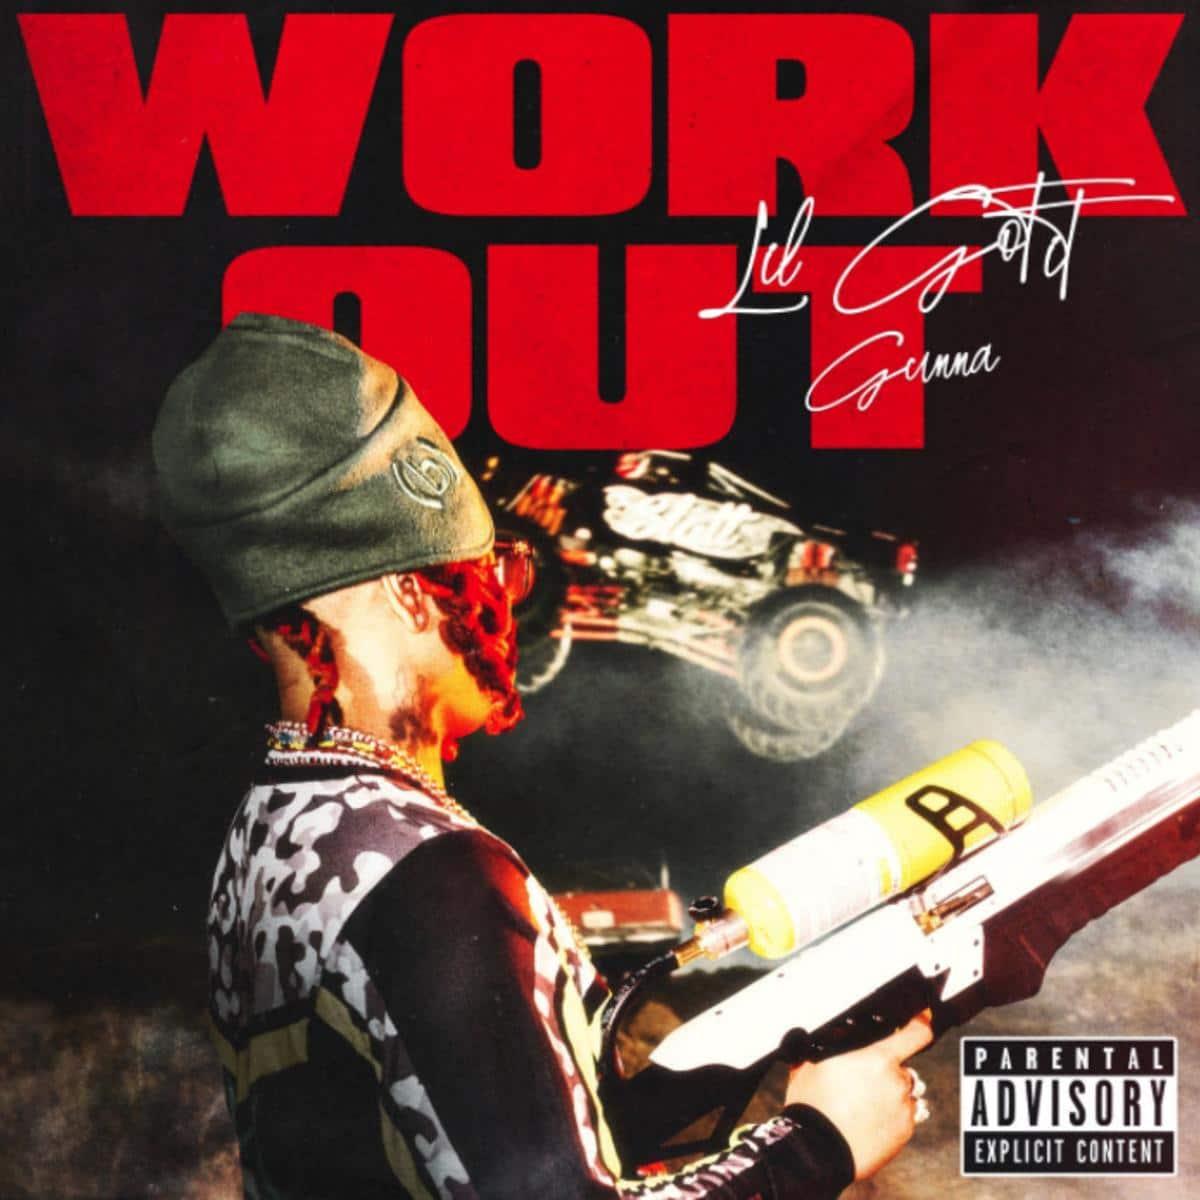 Lil Gotit Feat. Gunna - Work Out